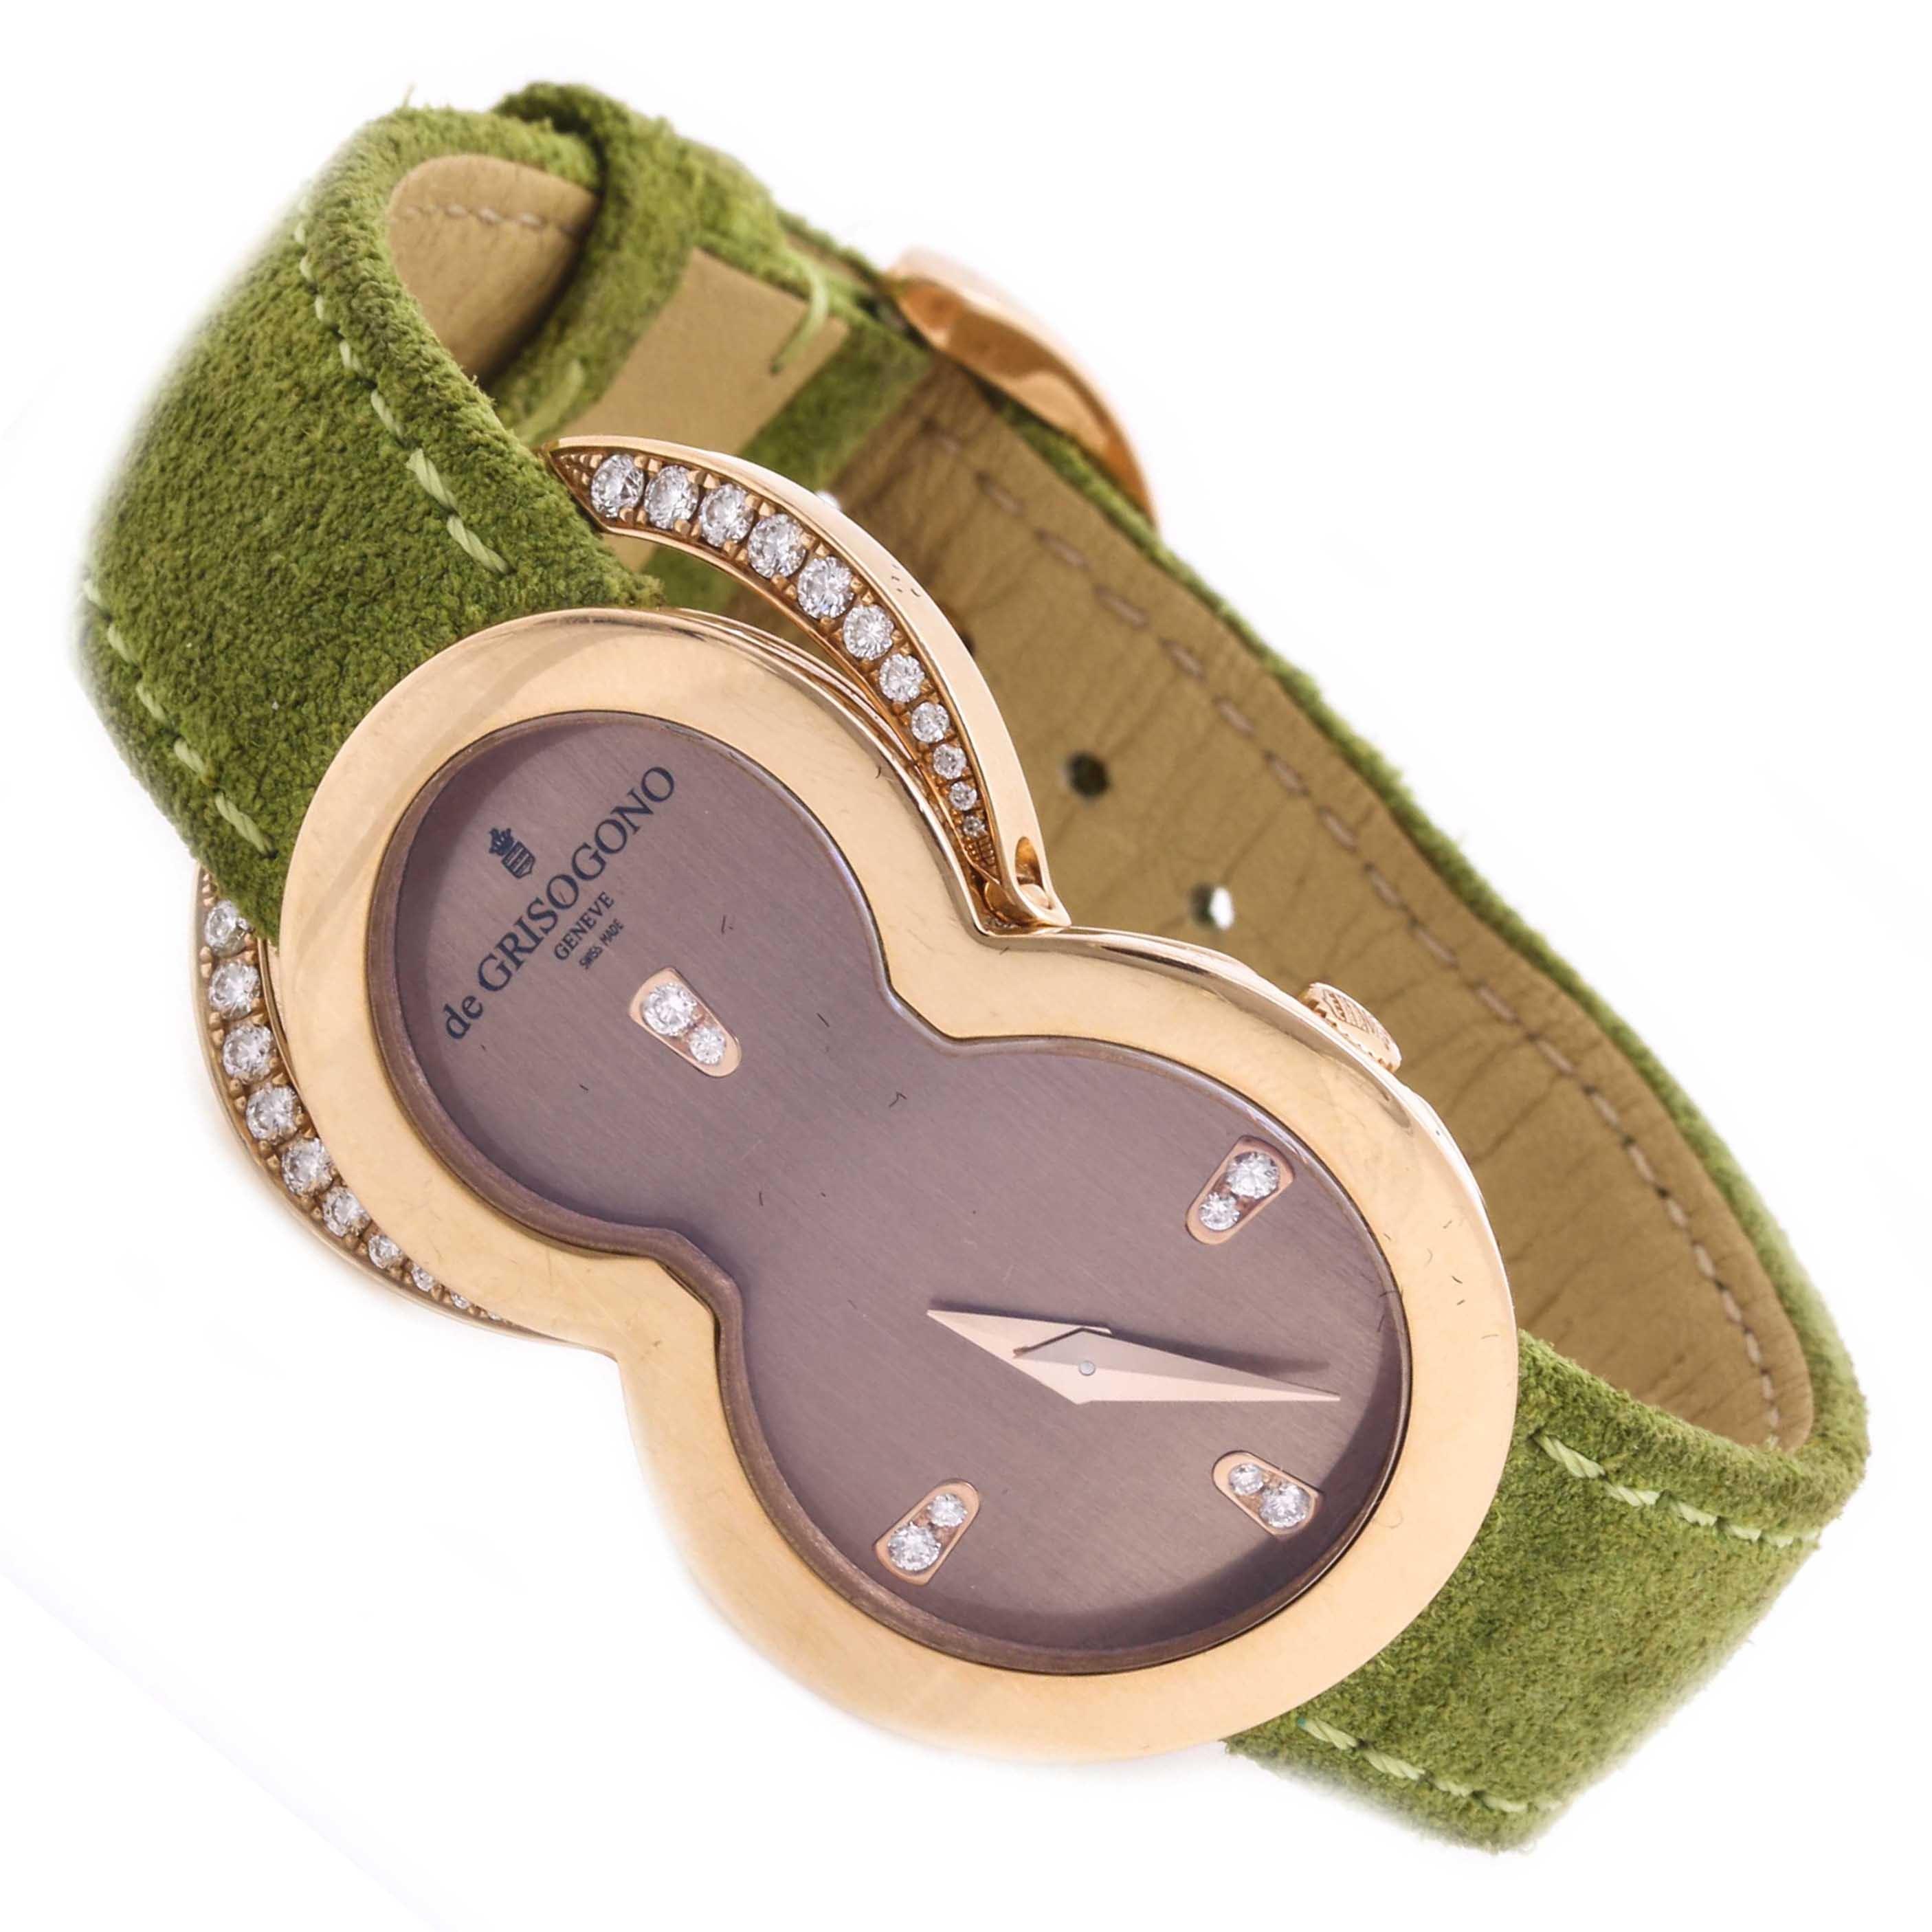 de GRISOGONO Be Eight 18K Rose Gold Diamond Wristwatch